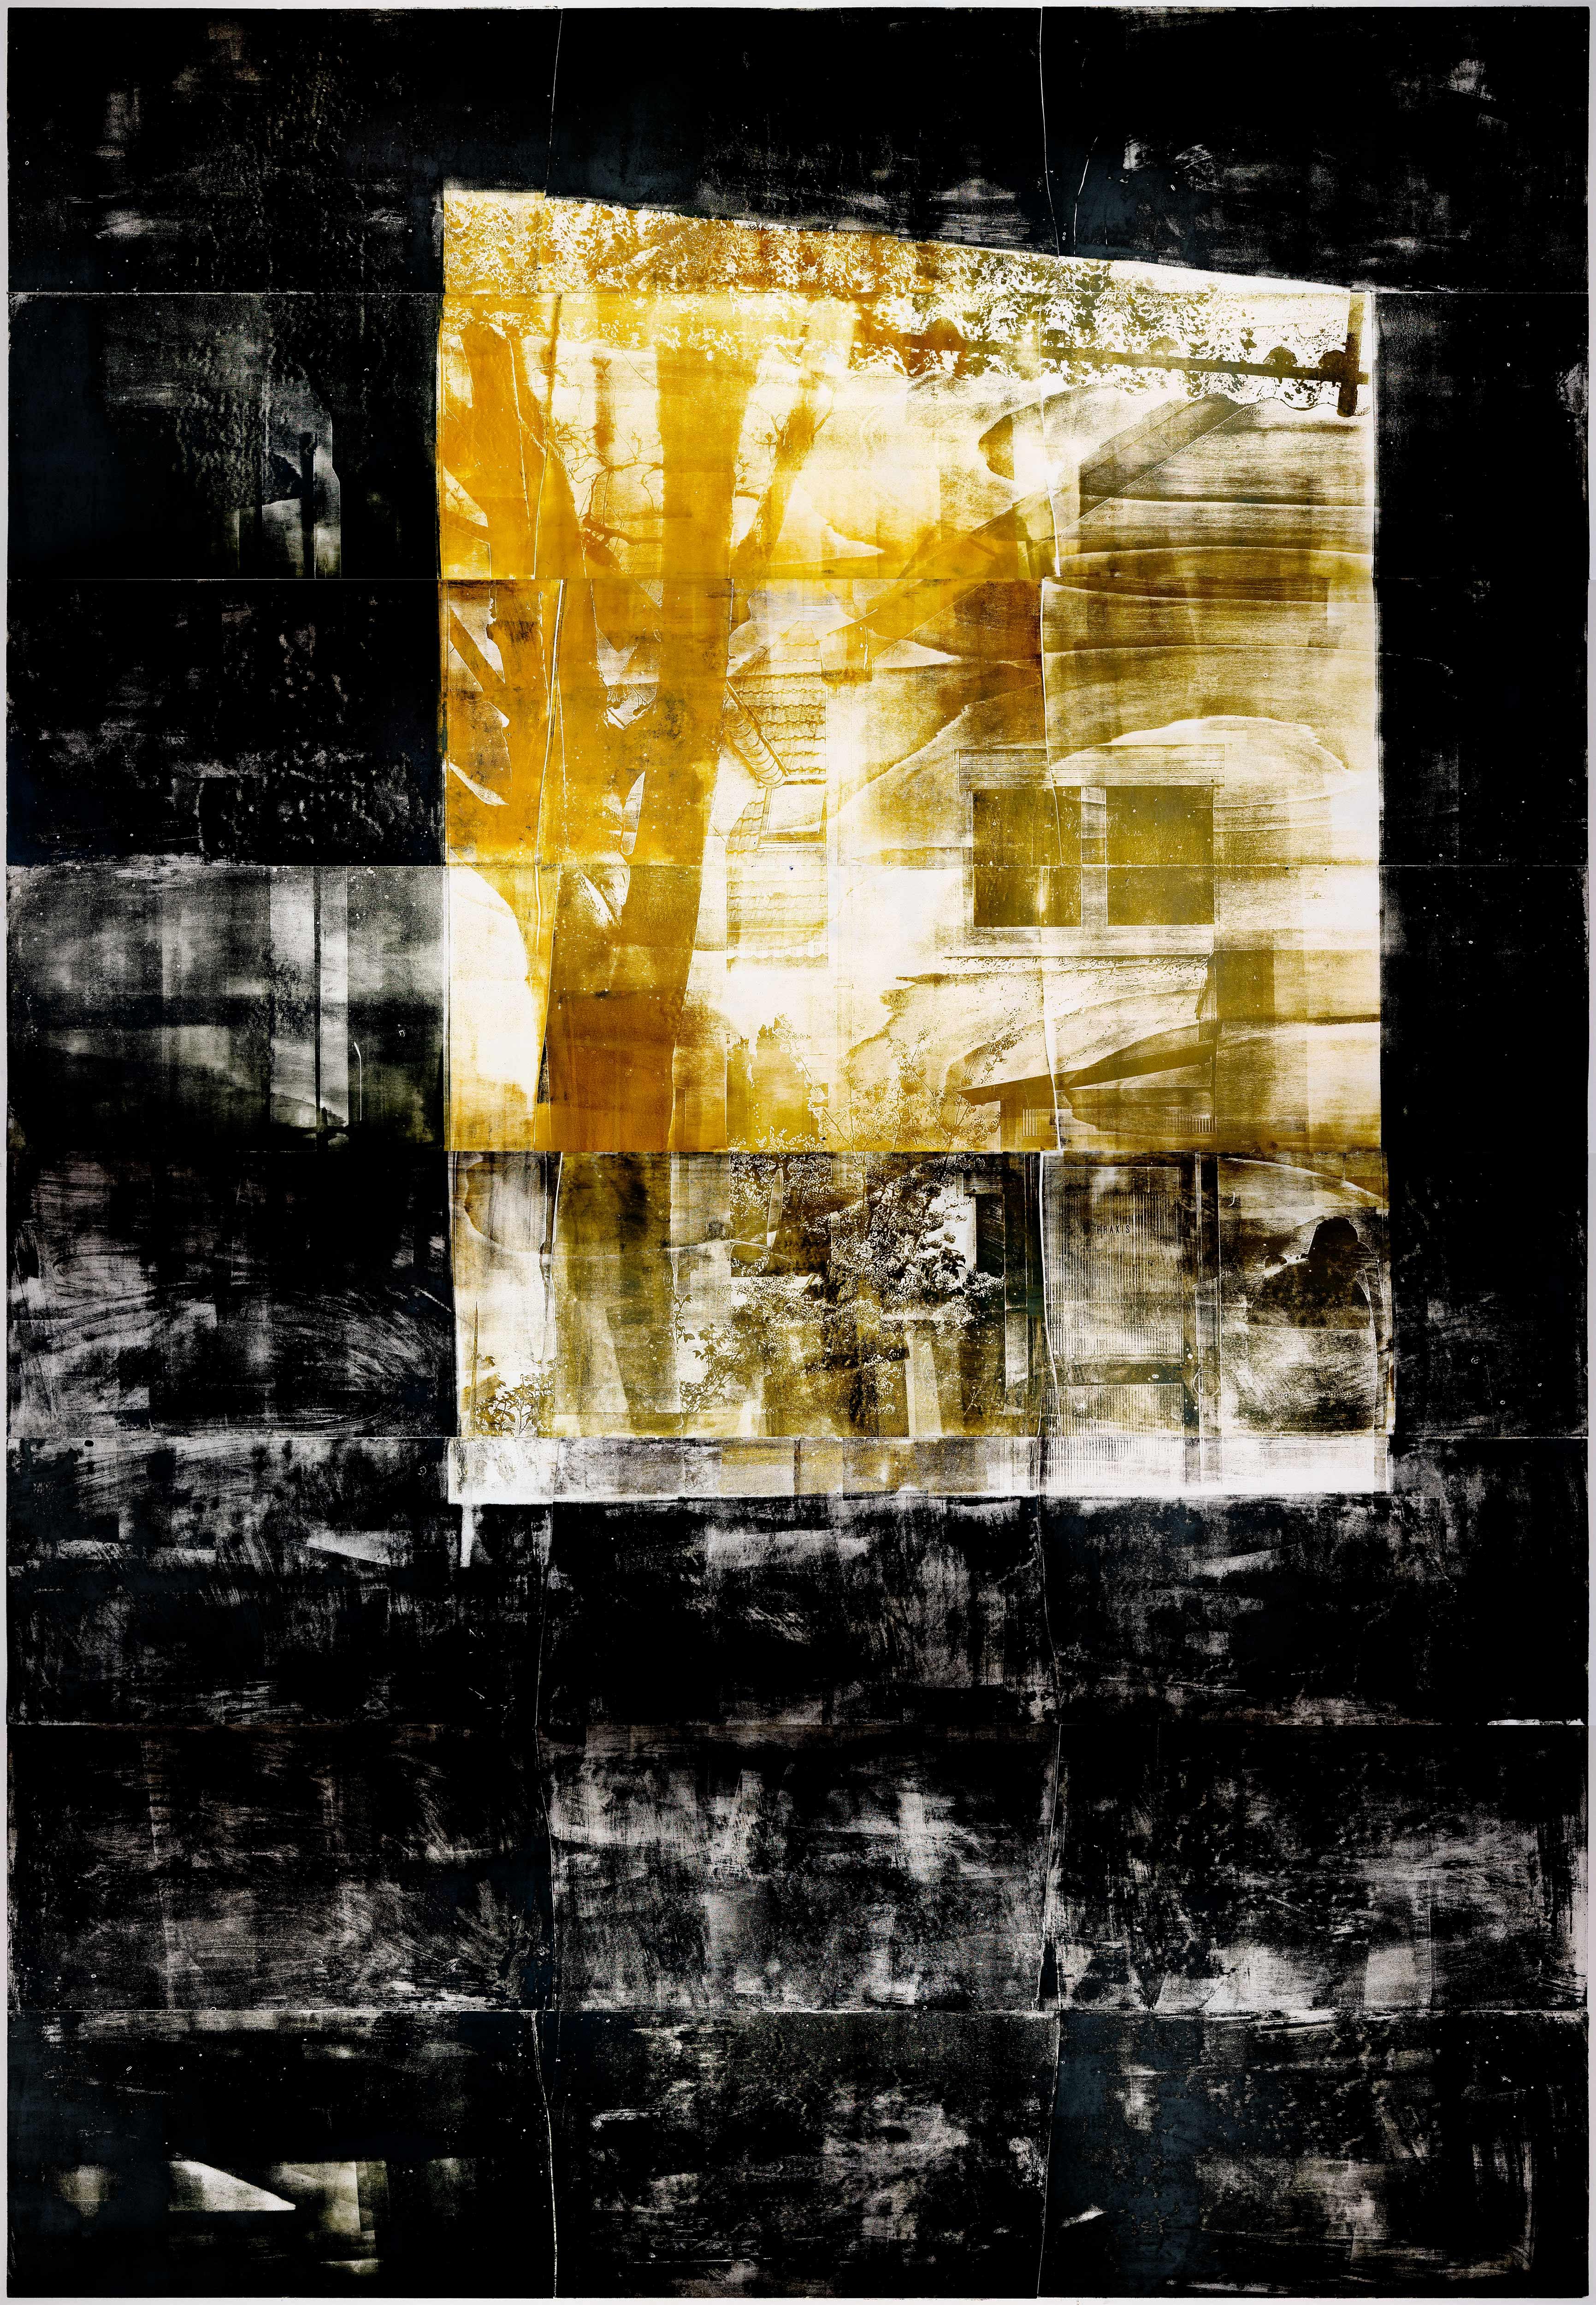 Fenster (Mitternacht), 2019, wood engraving, 384 x 273,1 cm, Genaro Strobel